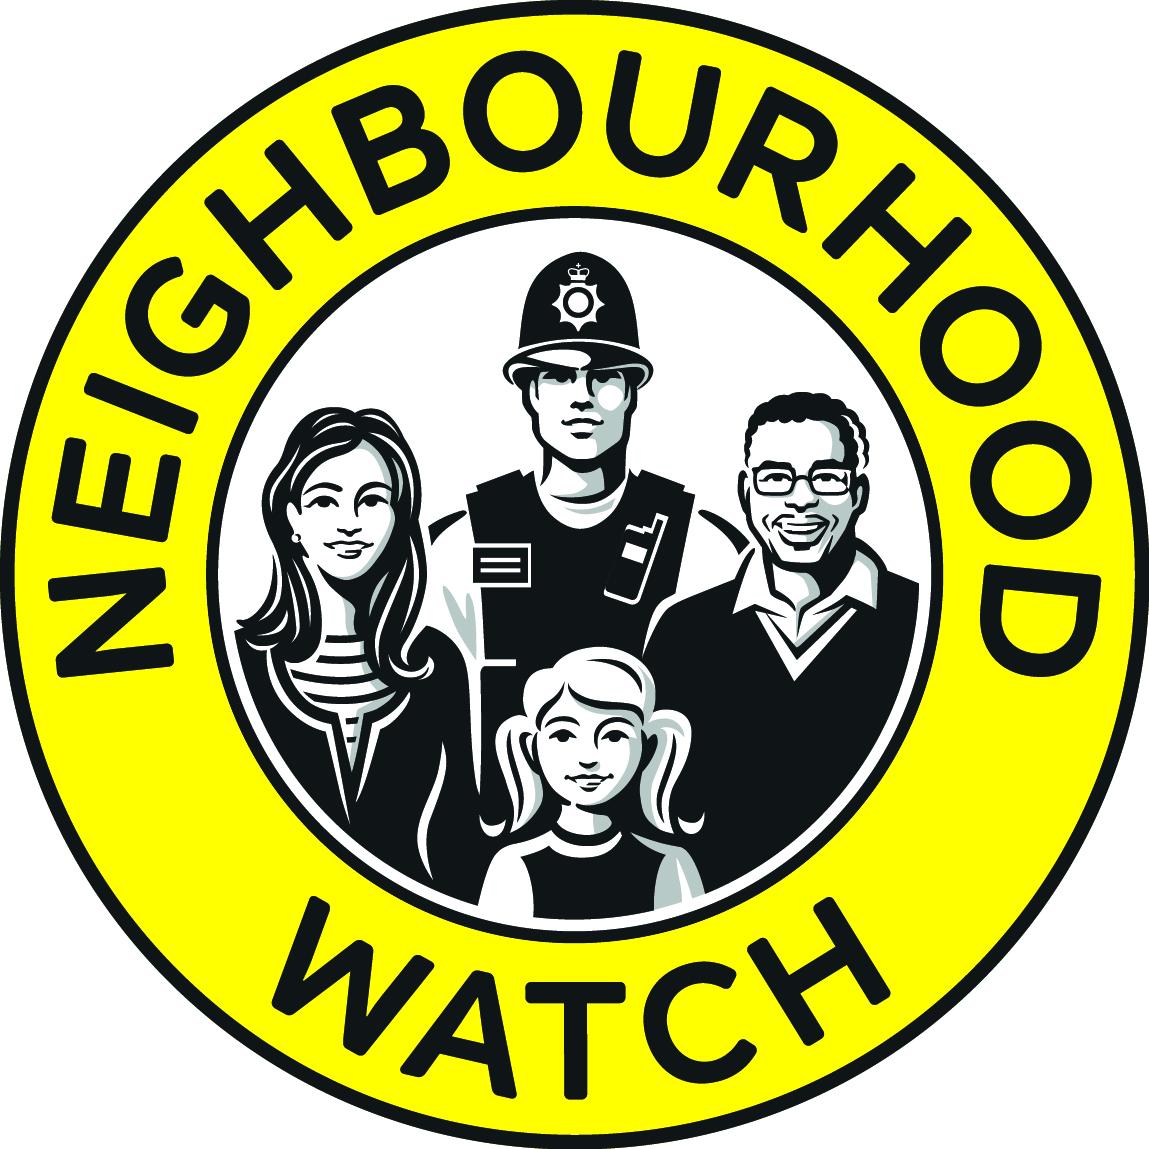 Nether Heyford Neighbourhood Watch.jpg